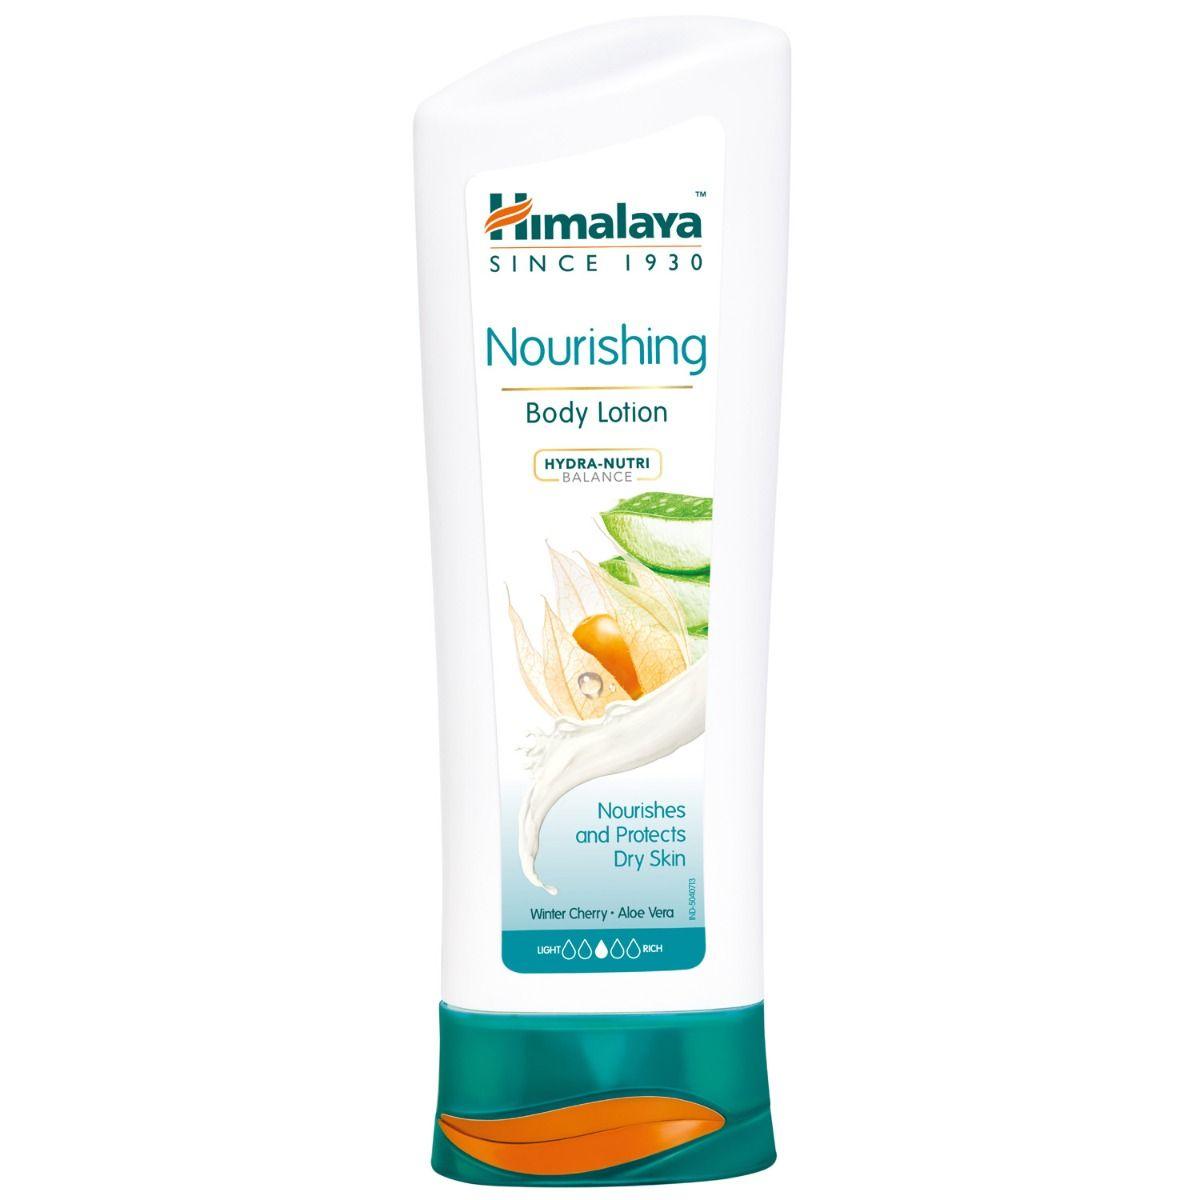 Himalaya Nourishing Body Lotion, 200 ml